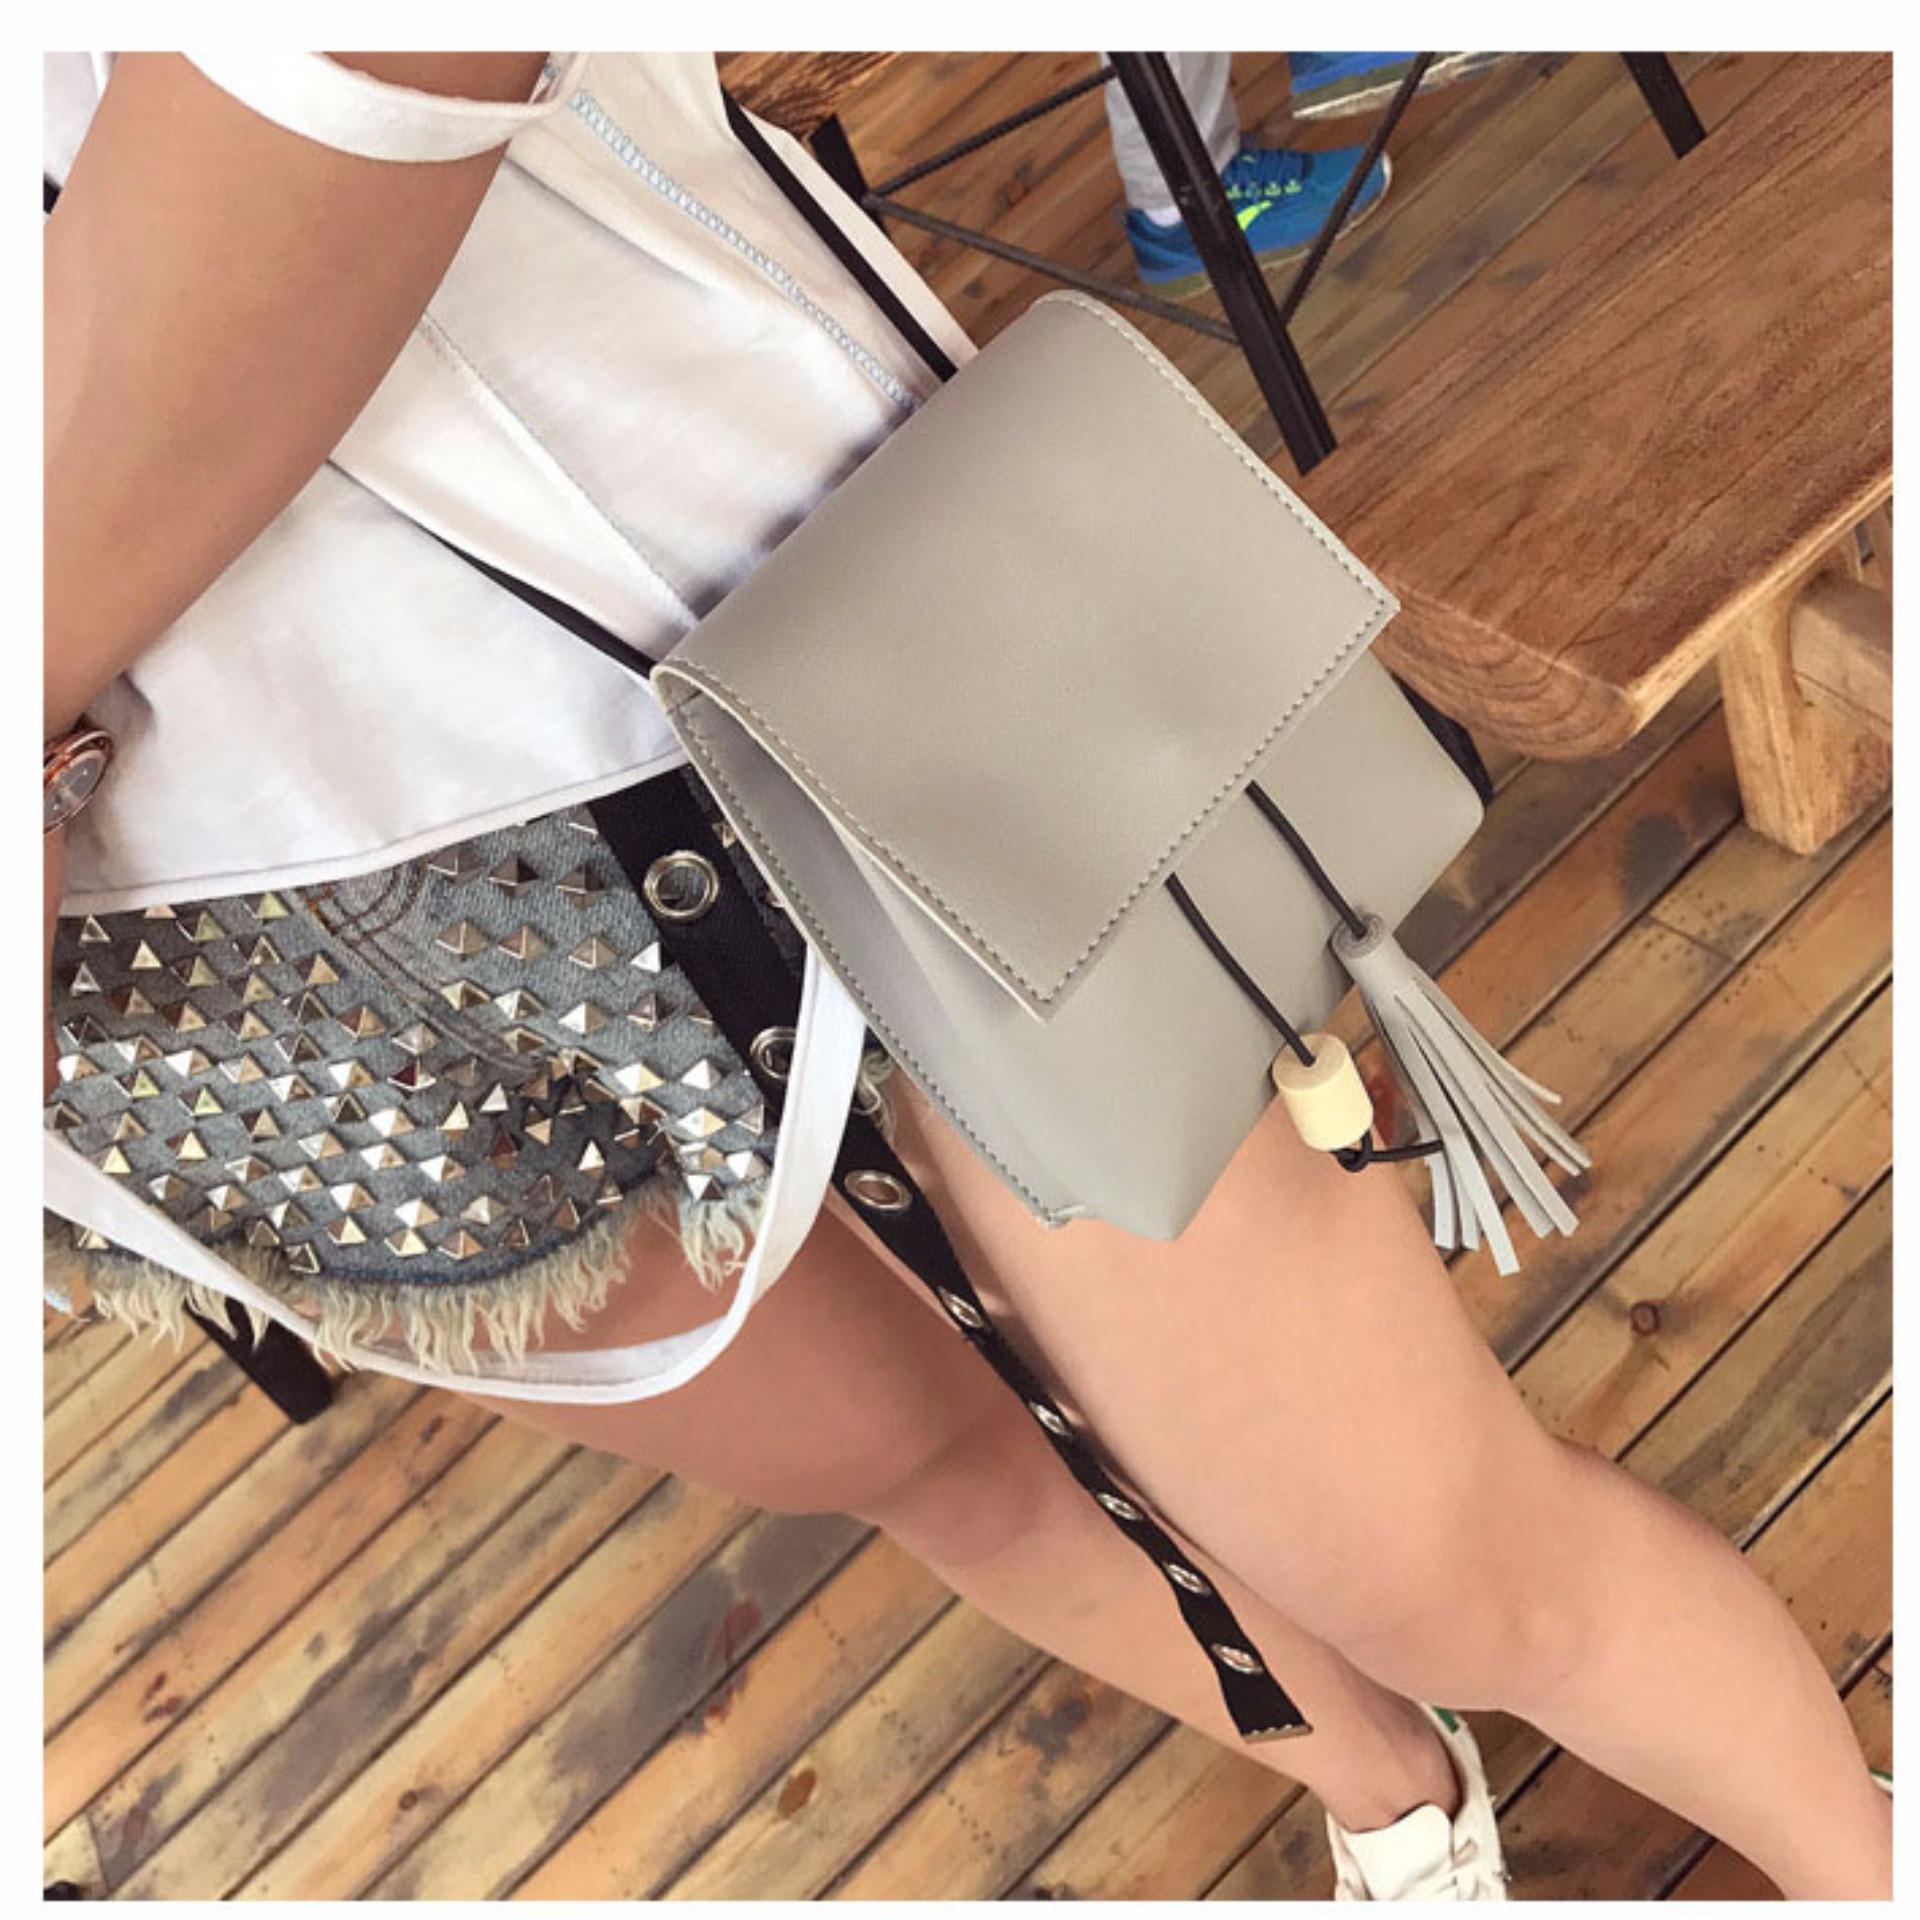 Spesifikasi Hangkingkong Tas Selempang Wanita Mini Sling Bag Korean Style Grey Abu Abu Paling Bagus